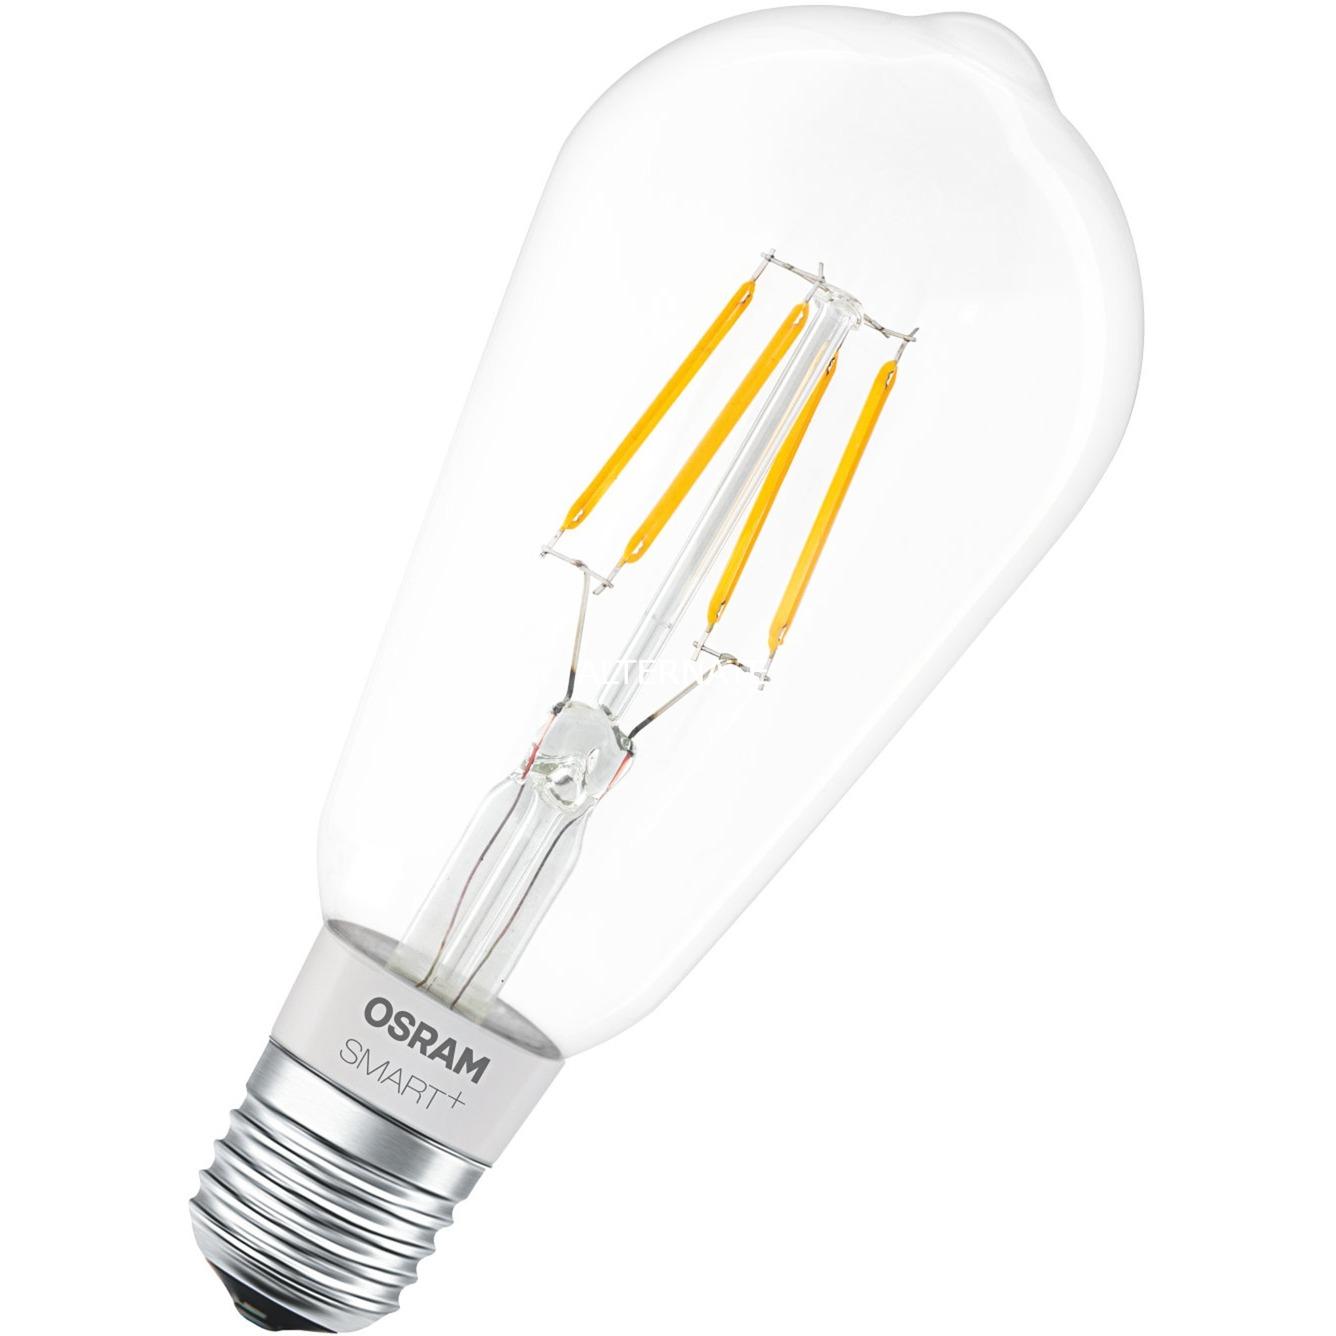 Smart + Filament Edison Bombilla inteligente Bluetooth 5,5 W, Lámpara LED